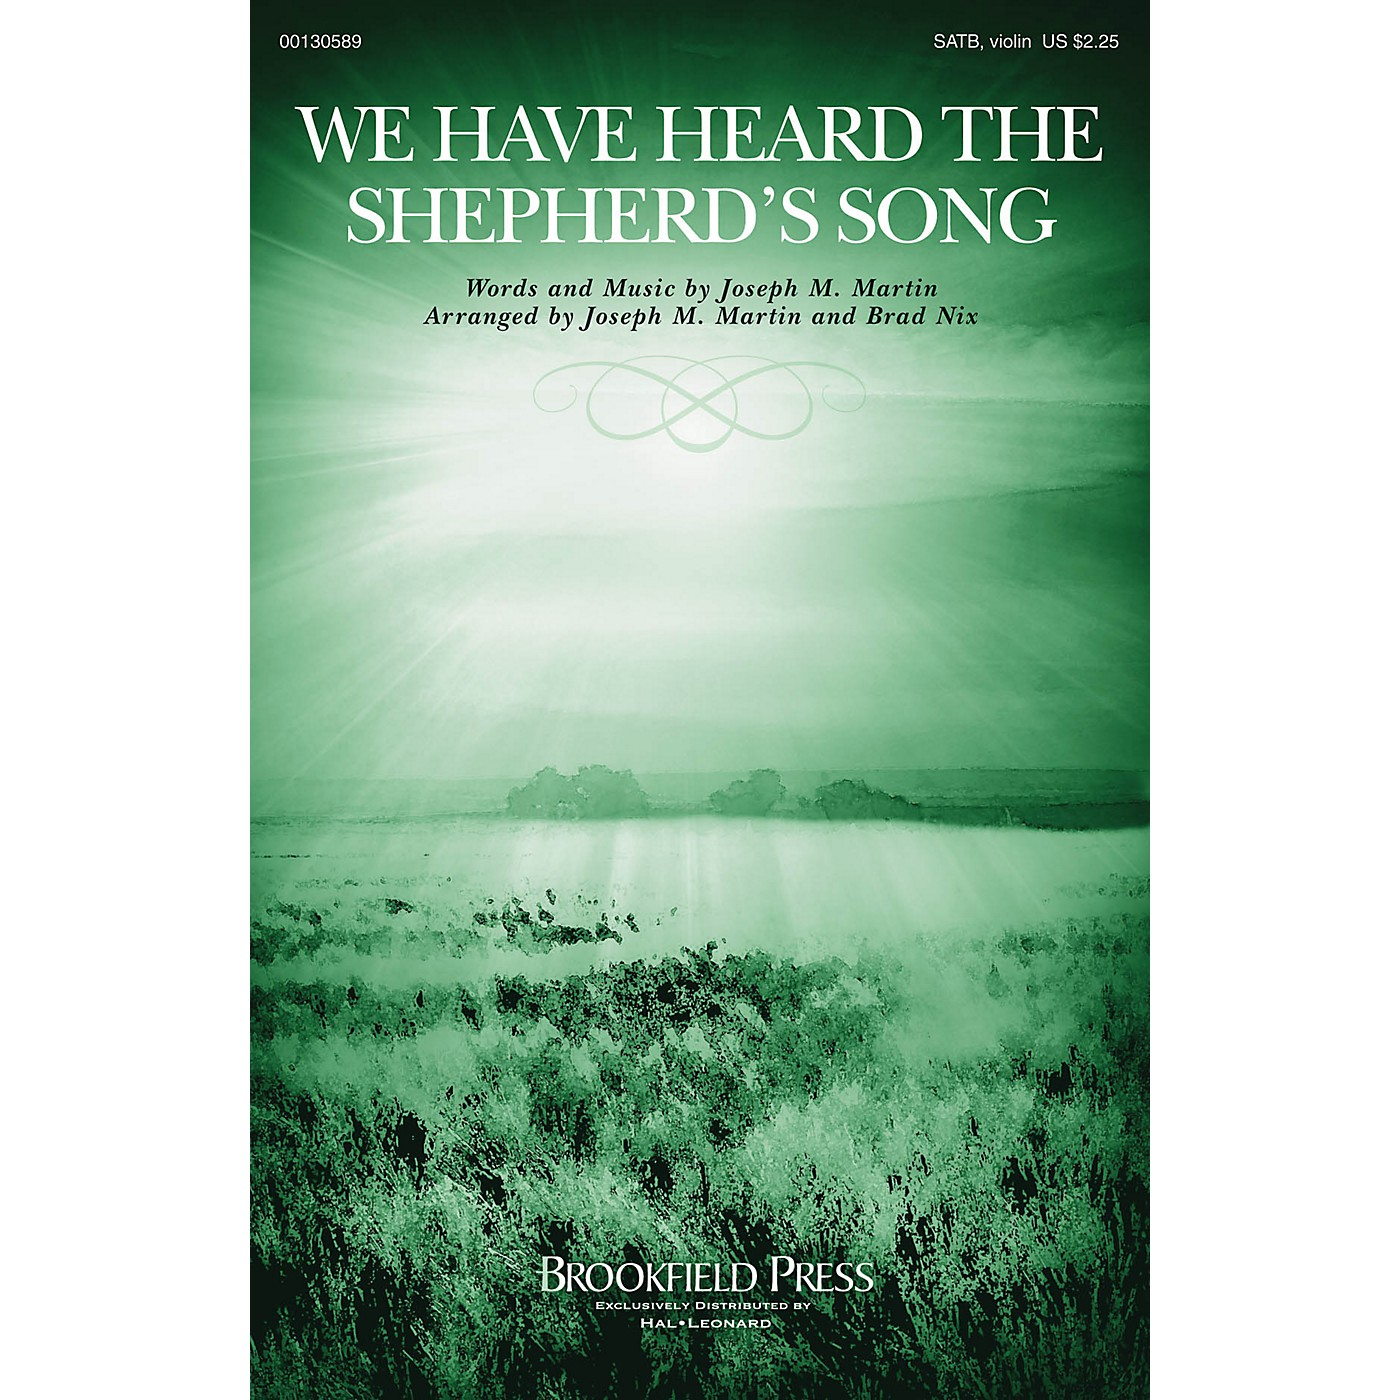 Brookfield We Have Heard the Shepherd's Song SATB W/ VIOLIN arranged by Joseph M. Martin thumbnail